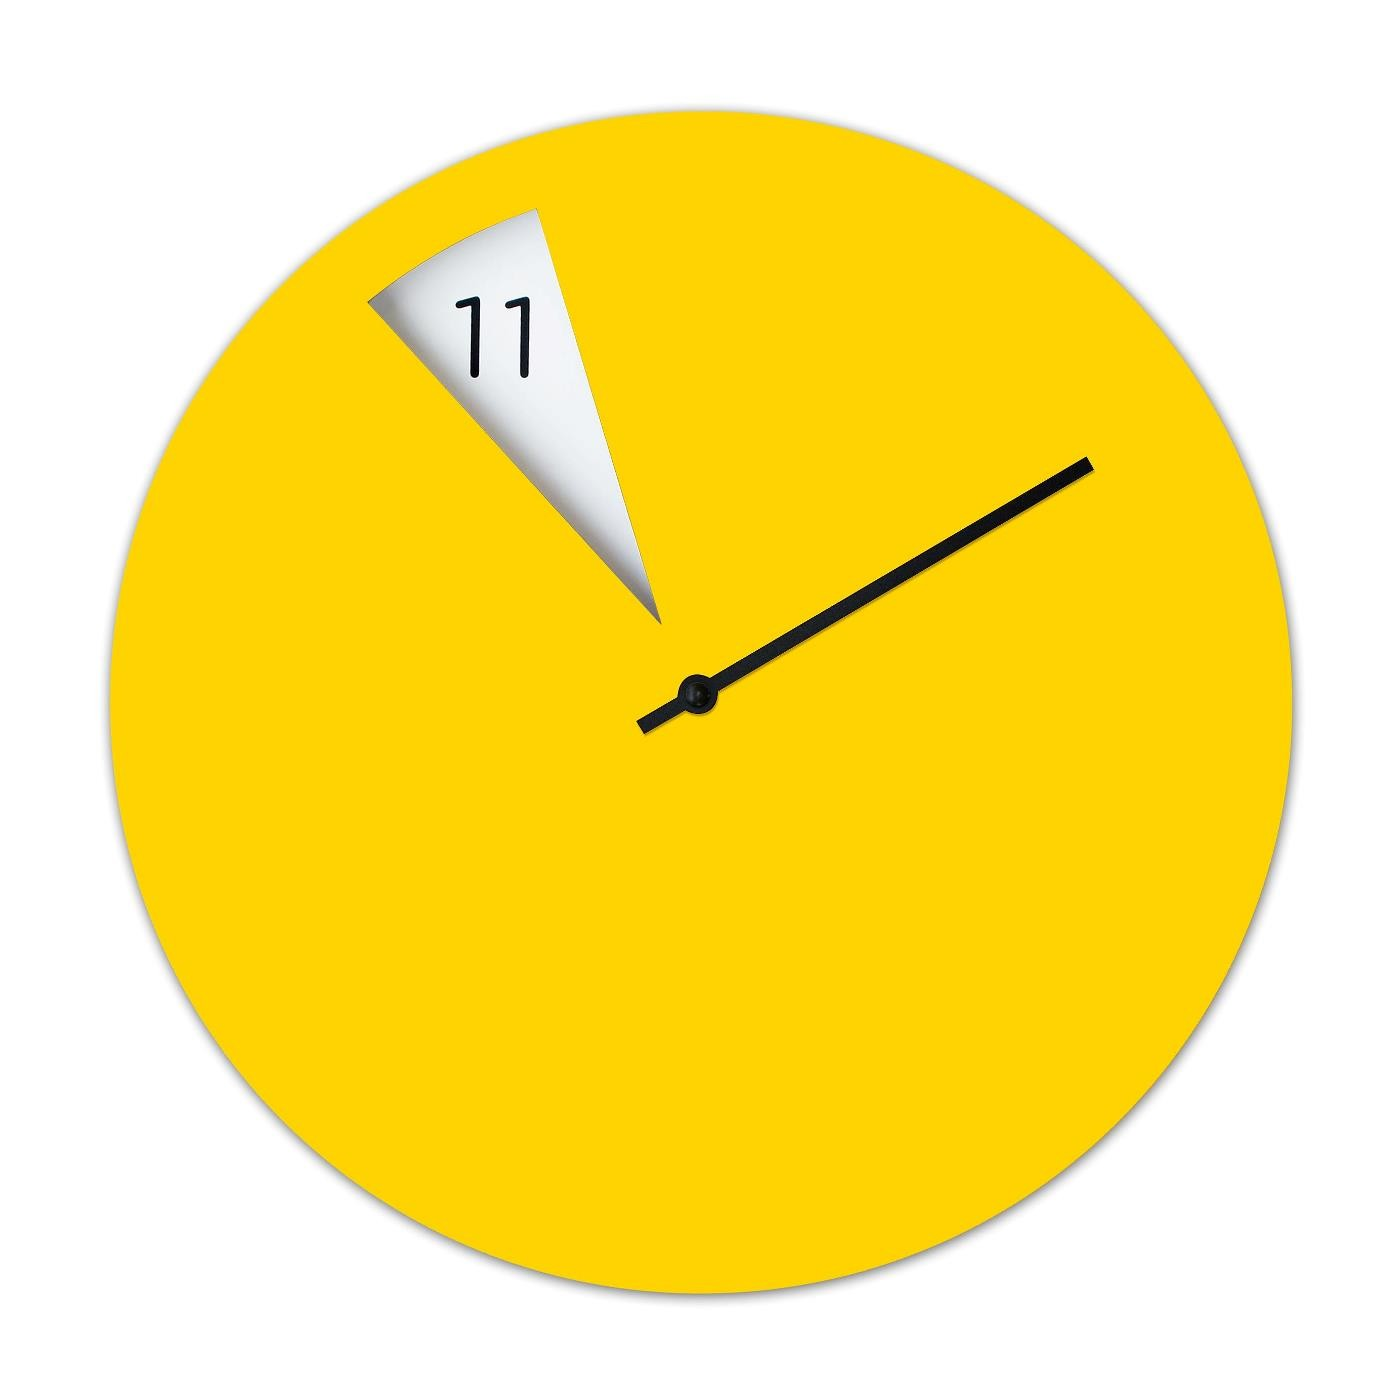 Freakish Wall Clock Yellow Sabrina Fossi Design Design